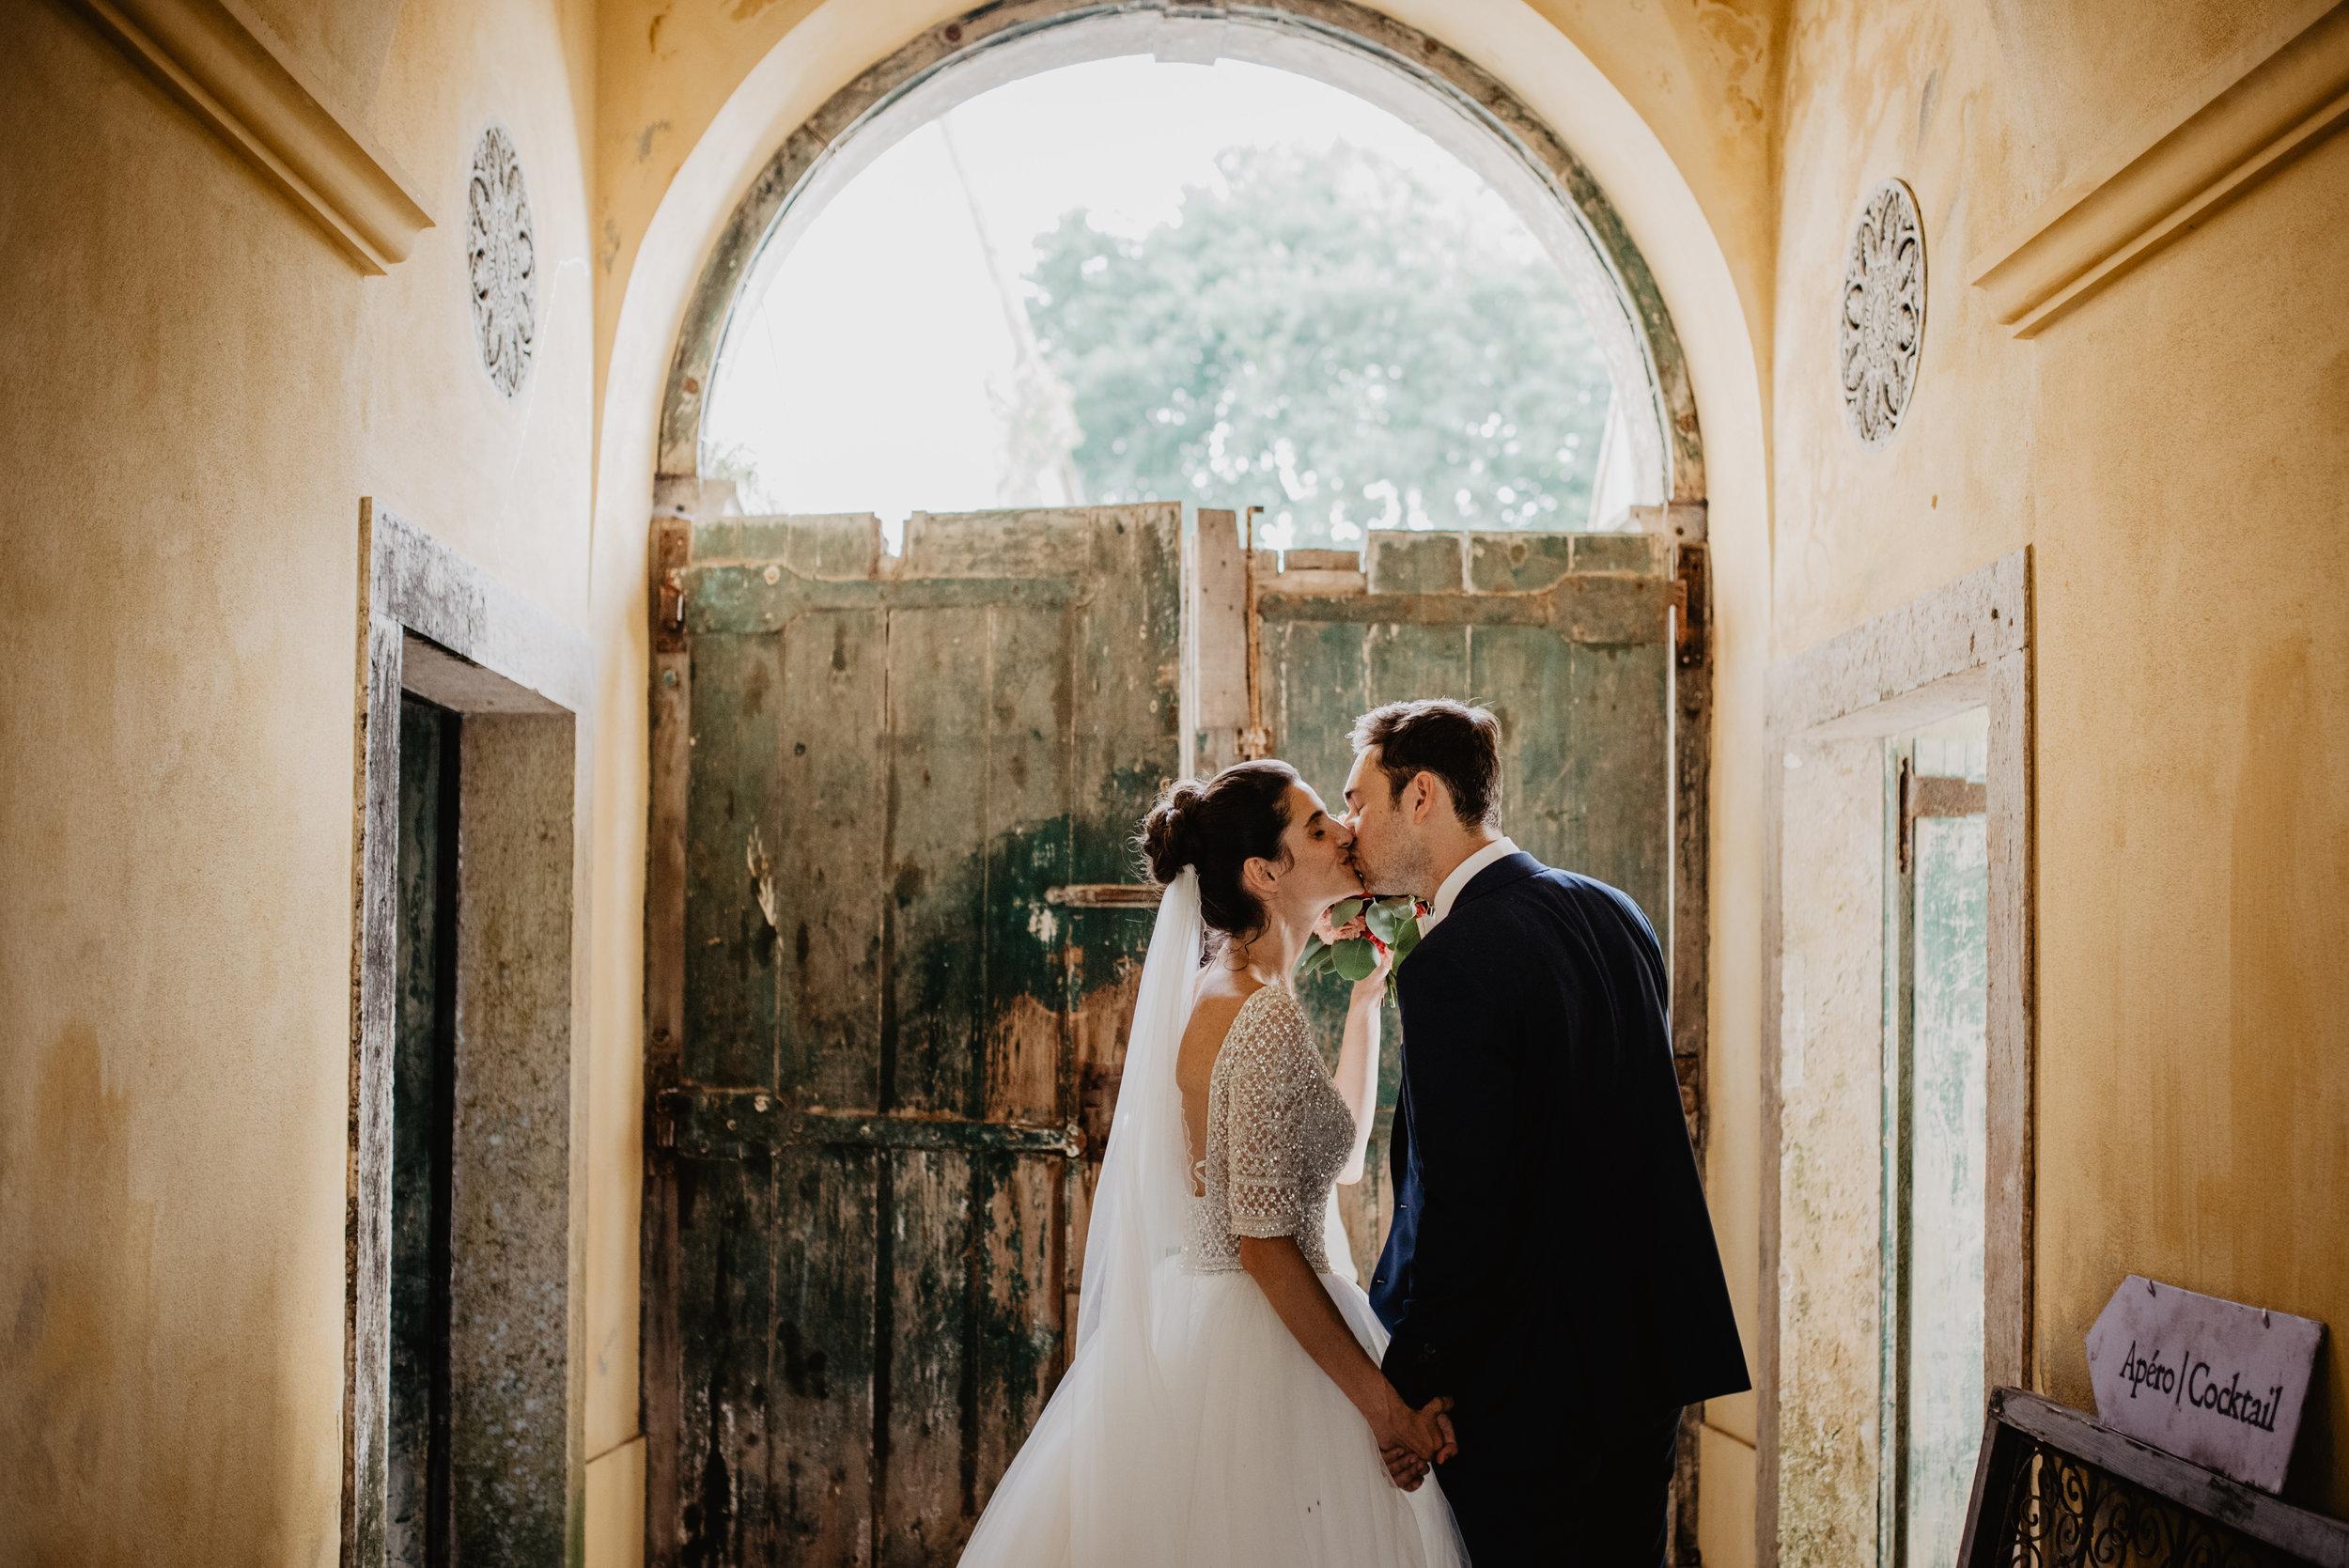 Lapela-photography-wedding-sintra-portugal-104.jpg